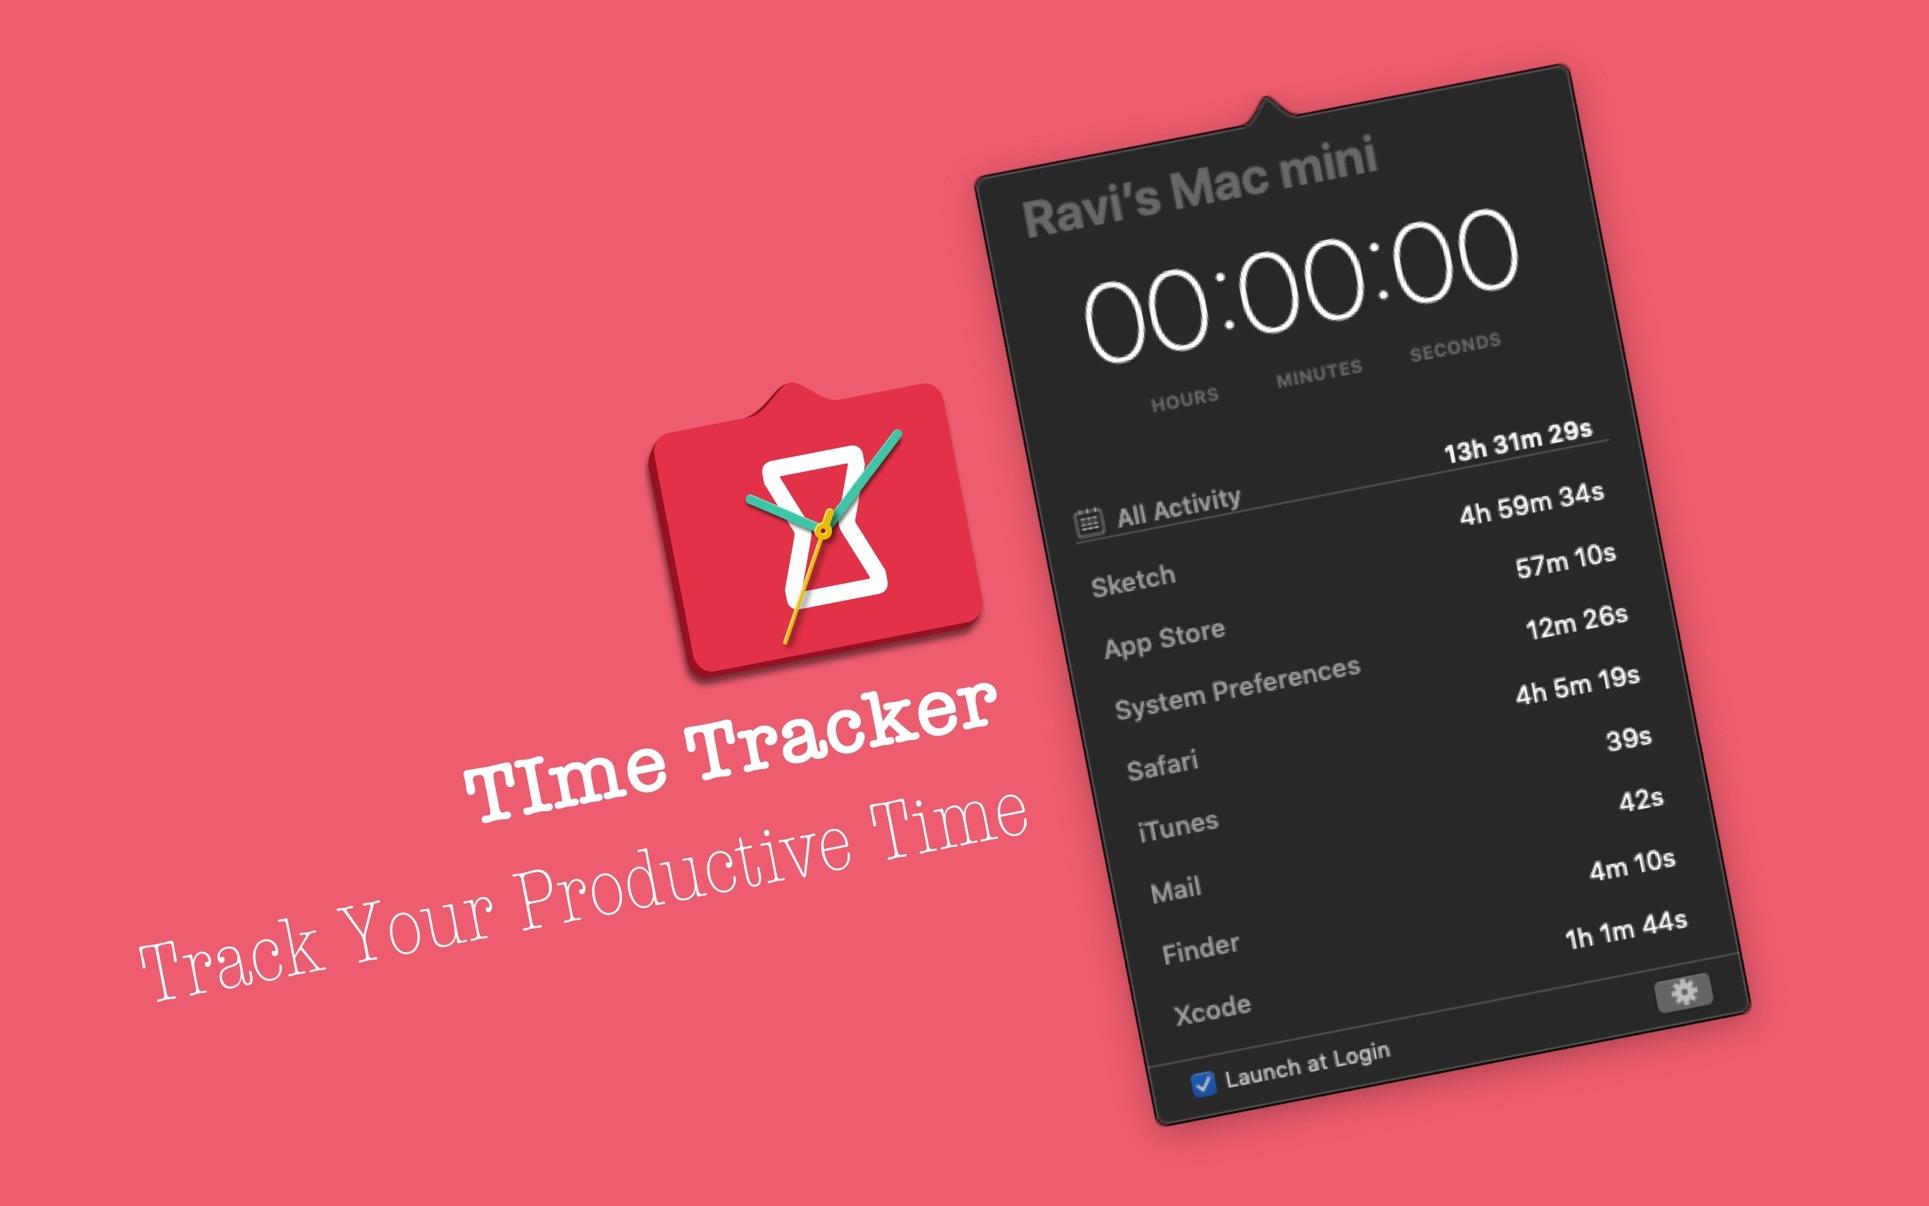 Timer Tracker